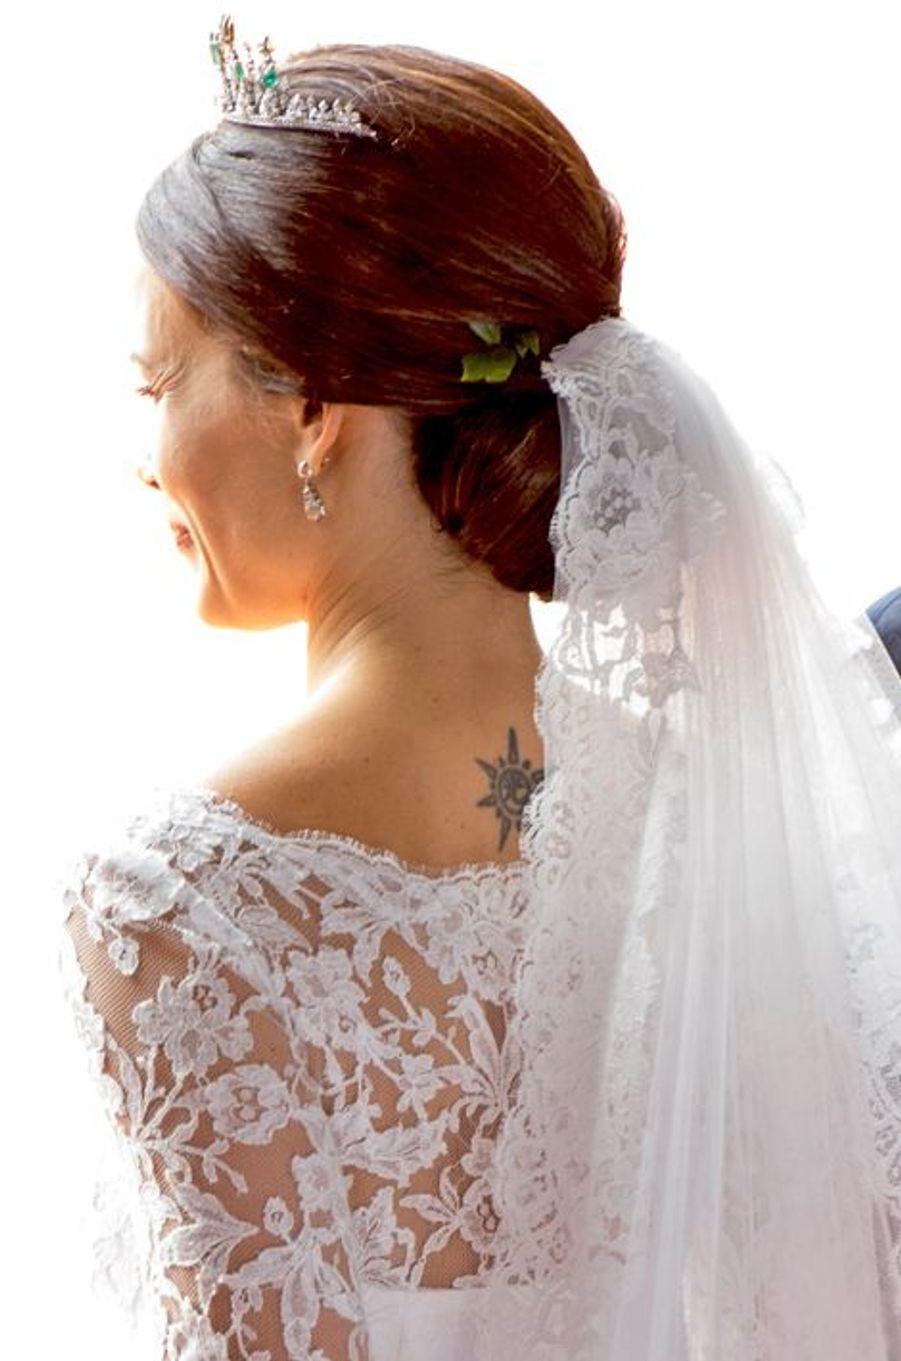 La princesse Sofia, resplendissante mariée, le 13 juin 2015